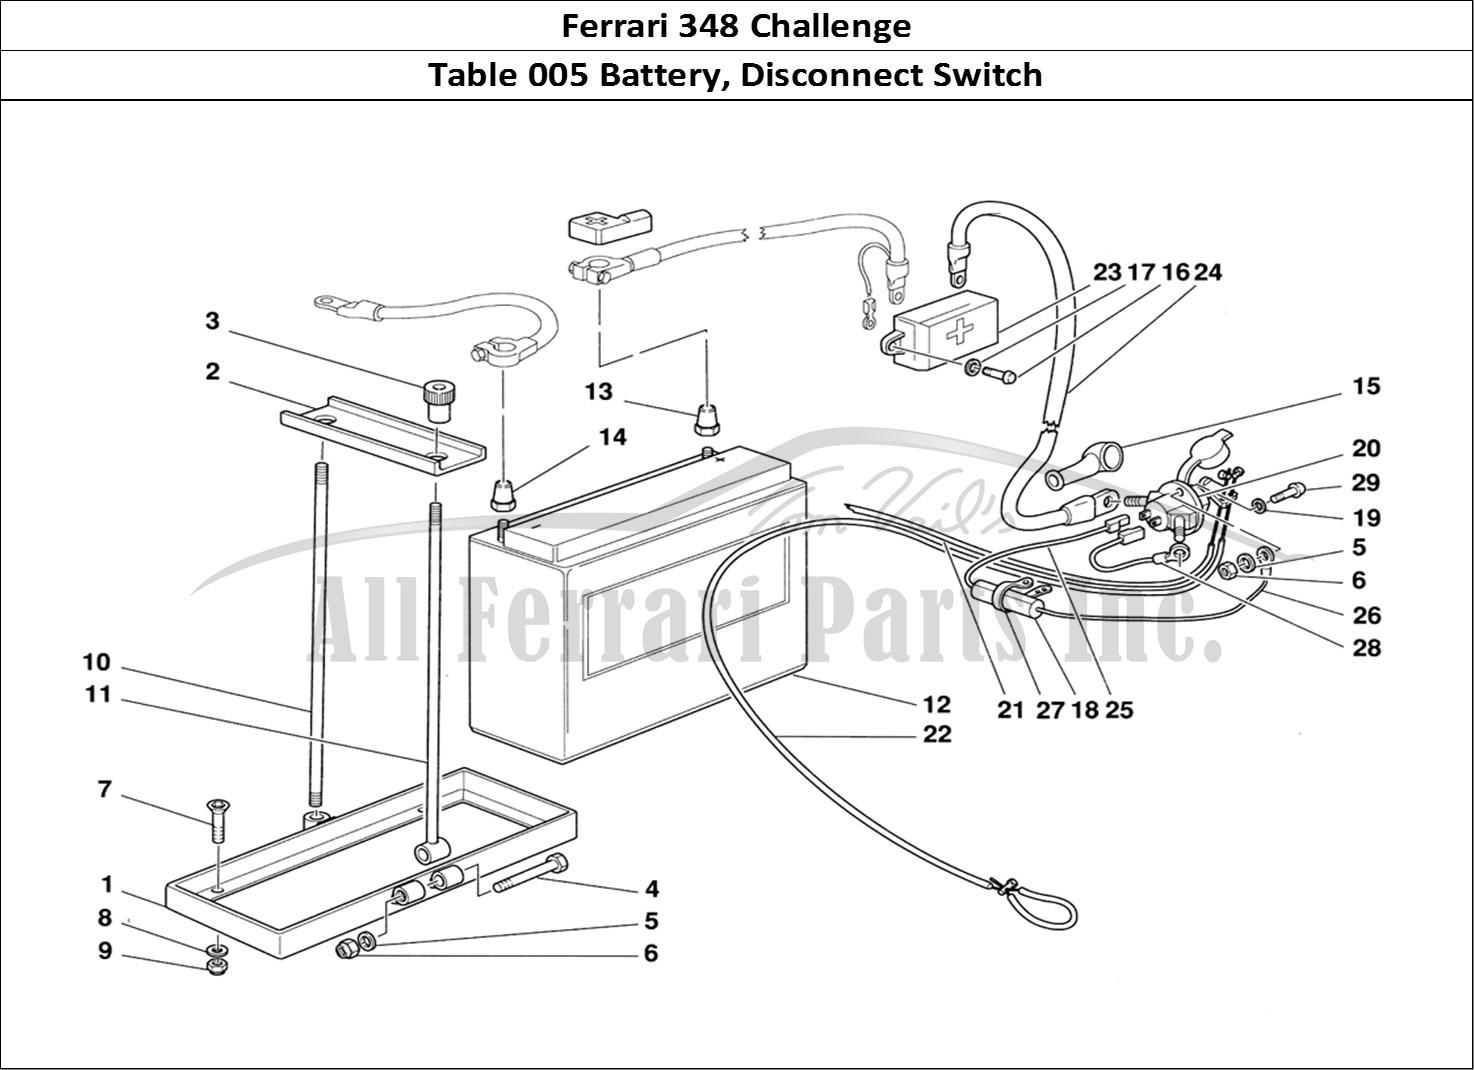 Buy original Ferrari 348 Challenge 005 Battery, Disconnect